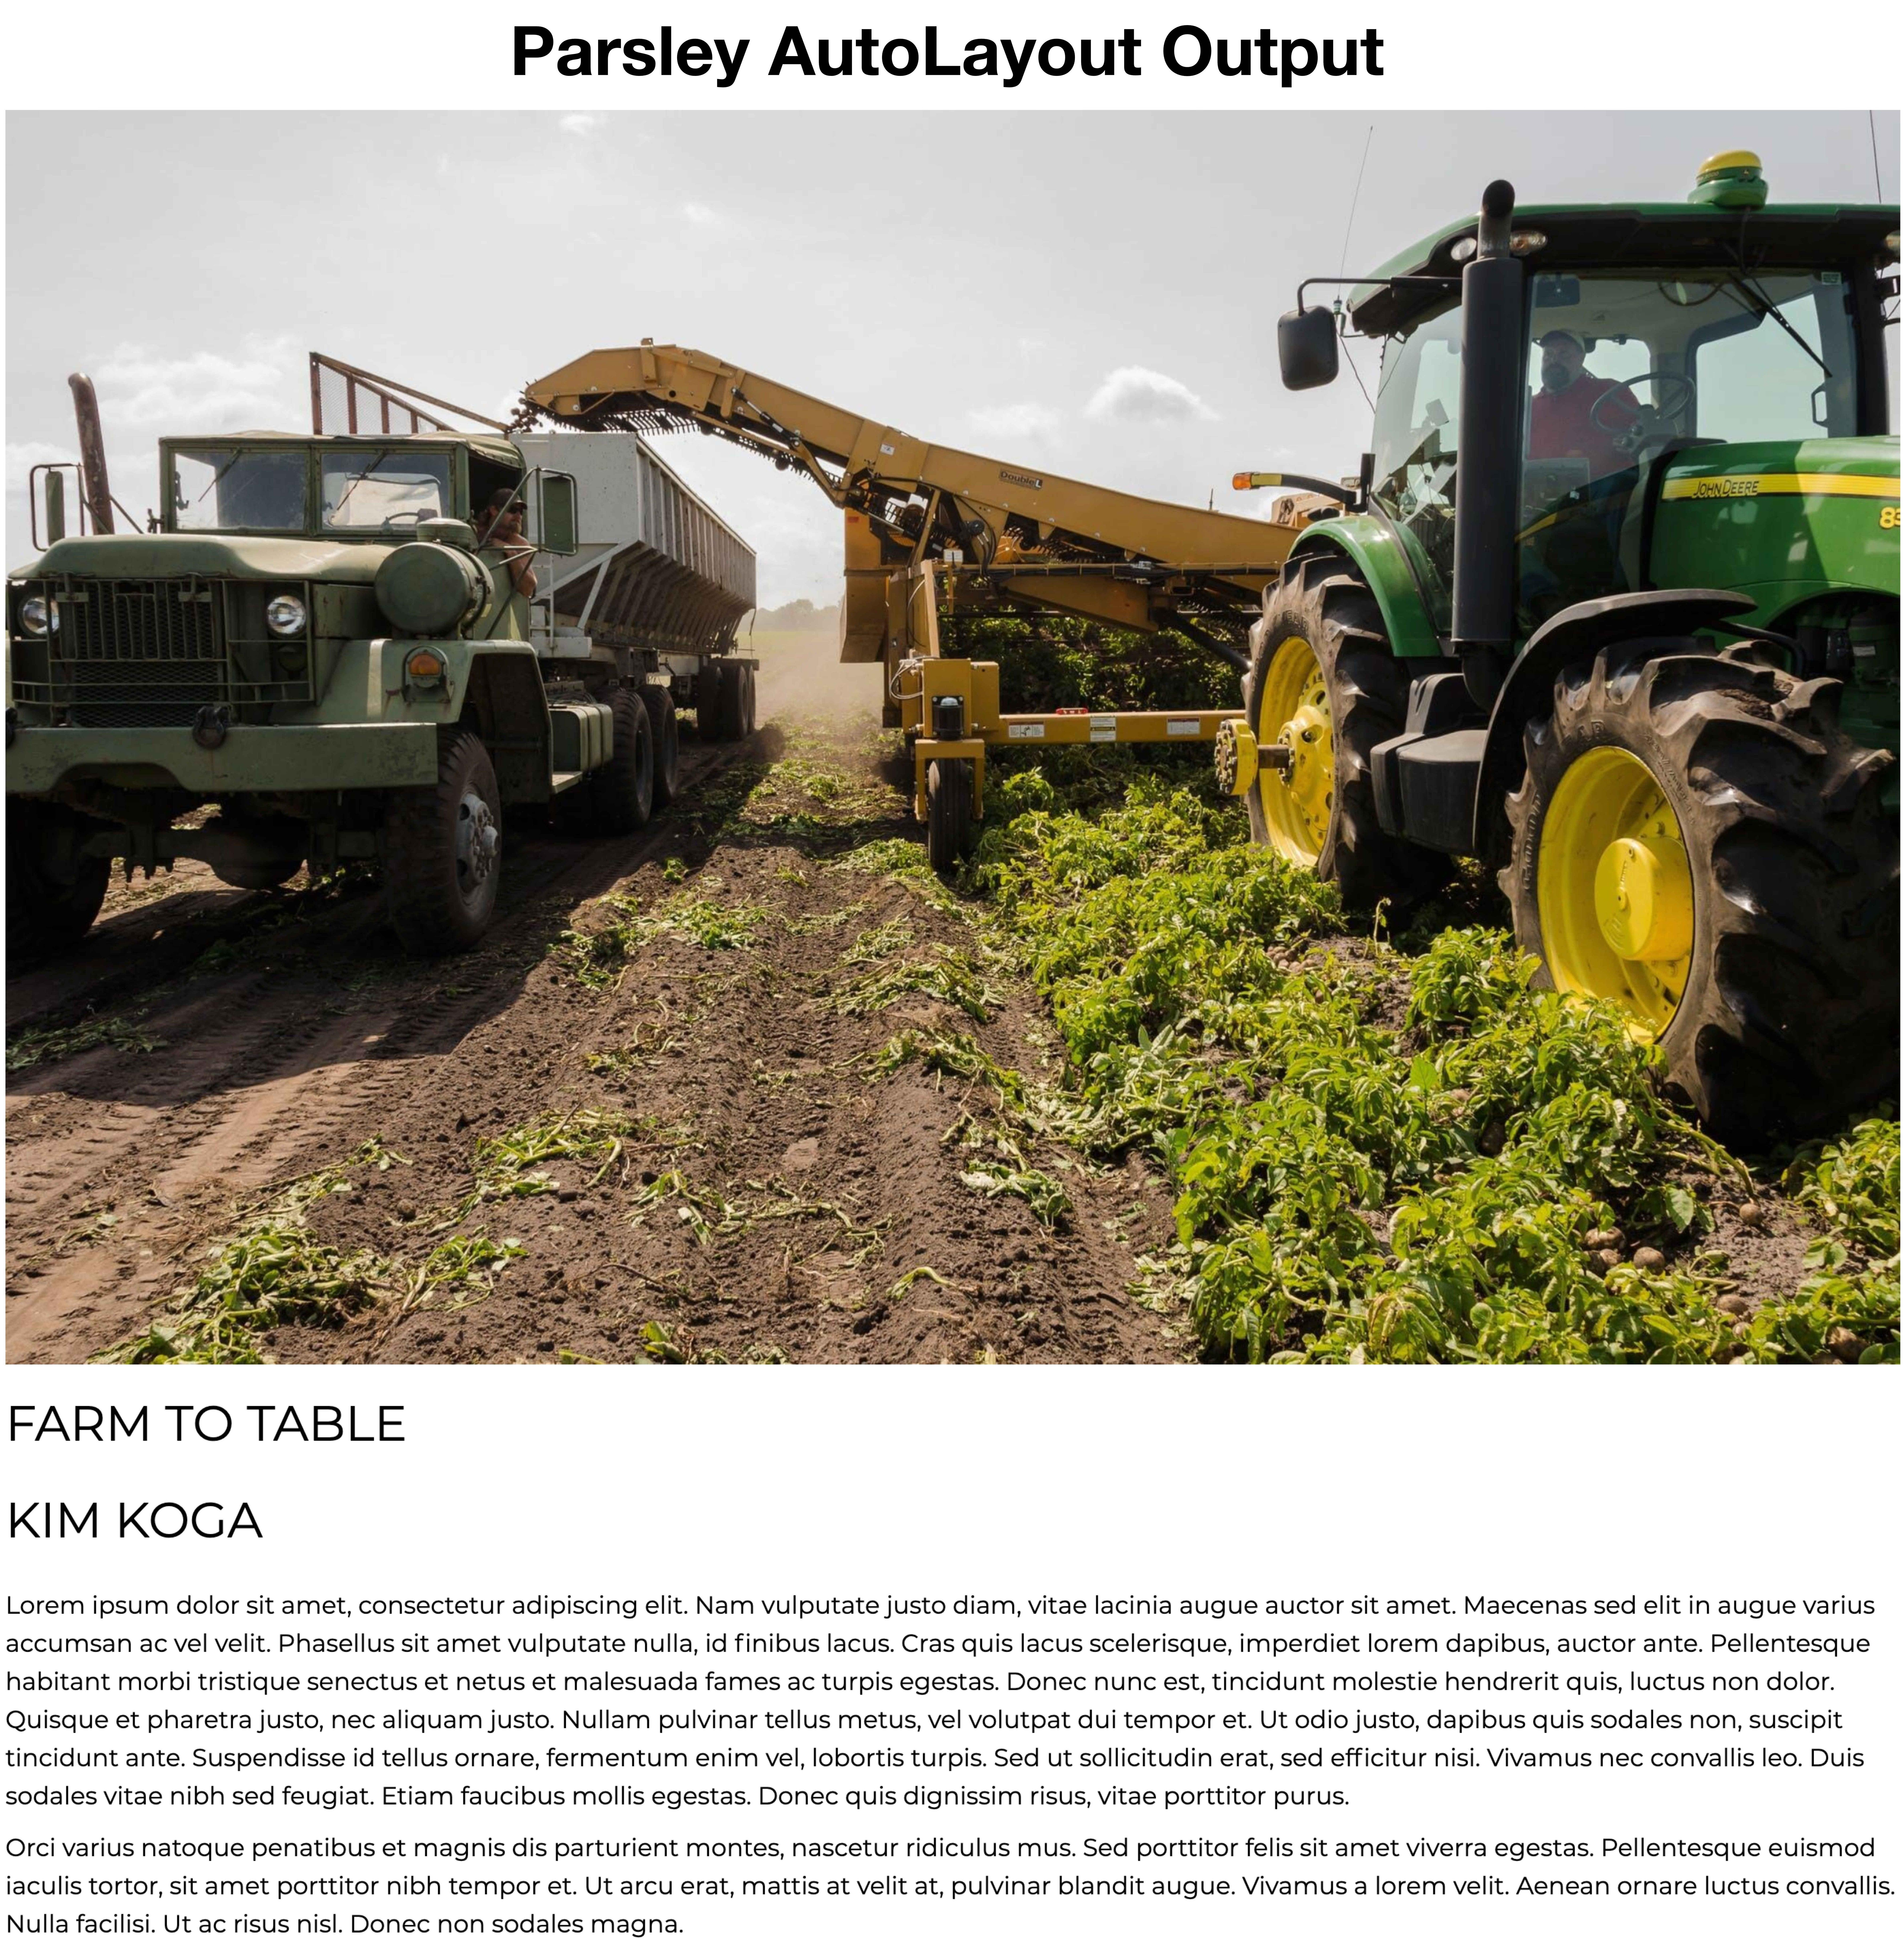 parsley-autolayout-output-03.jpg